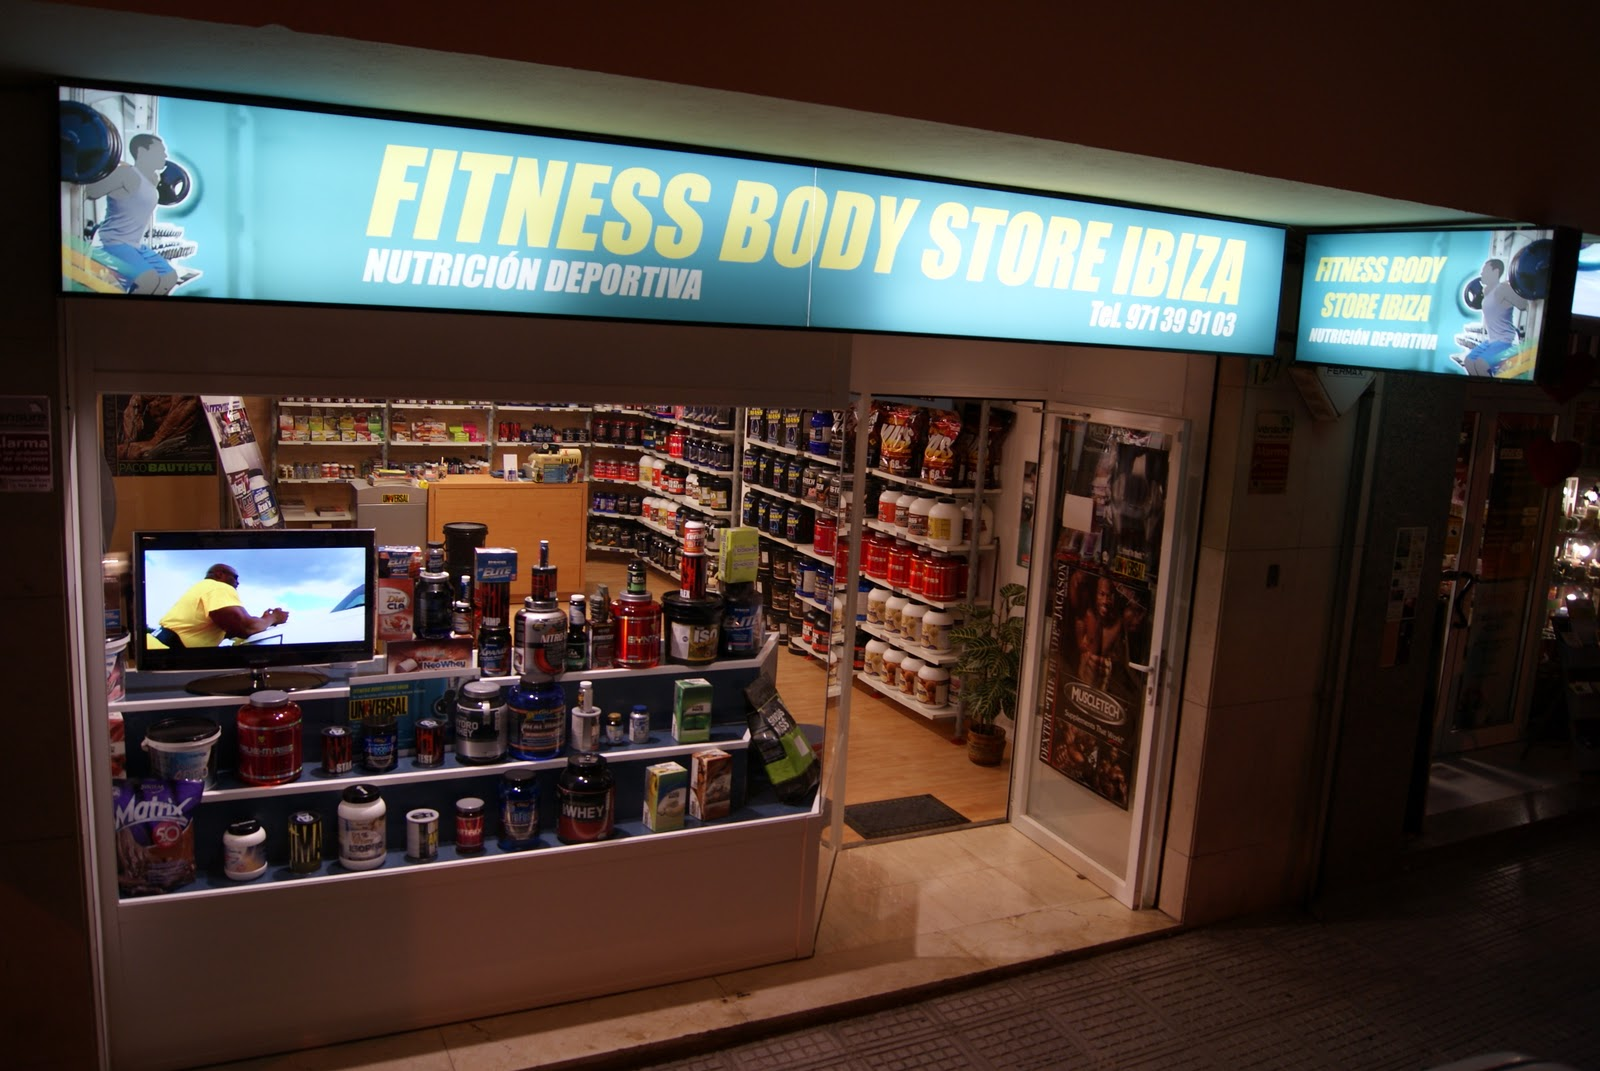 http://1.bp.blogspot.com/-8aEAy57epSM/ToikSwHIj8I/AAAAAAAAAPM/IE_D6V7g4Jc/s1600/Fitness%2BBody%2BStore%2BIbiza.JPG